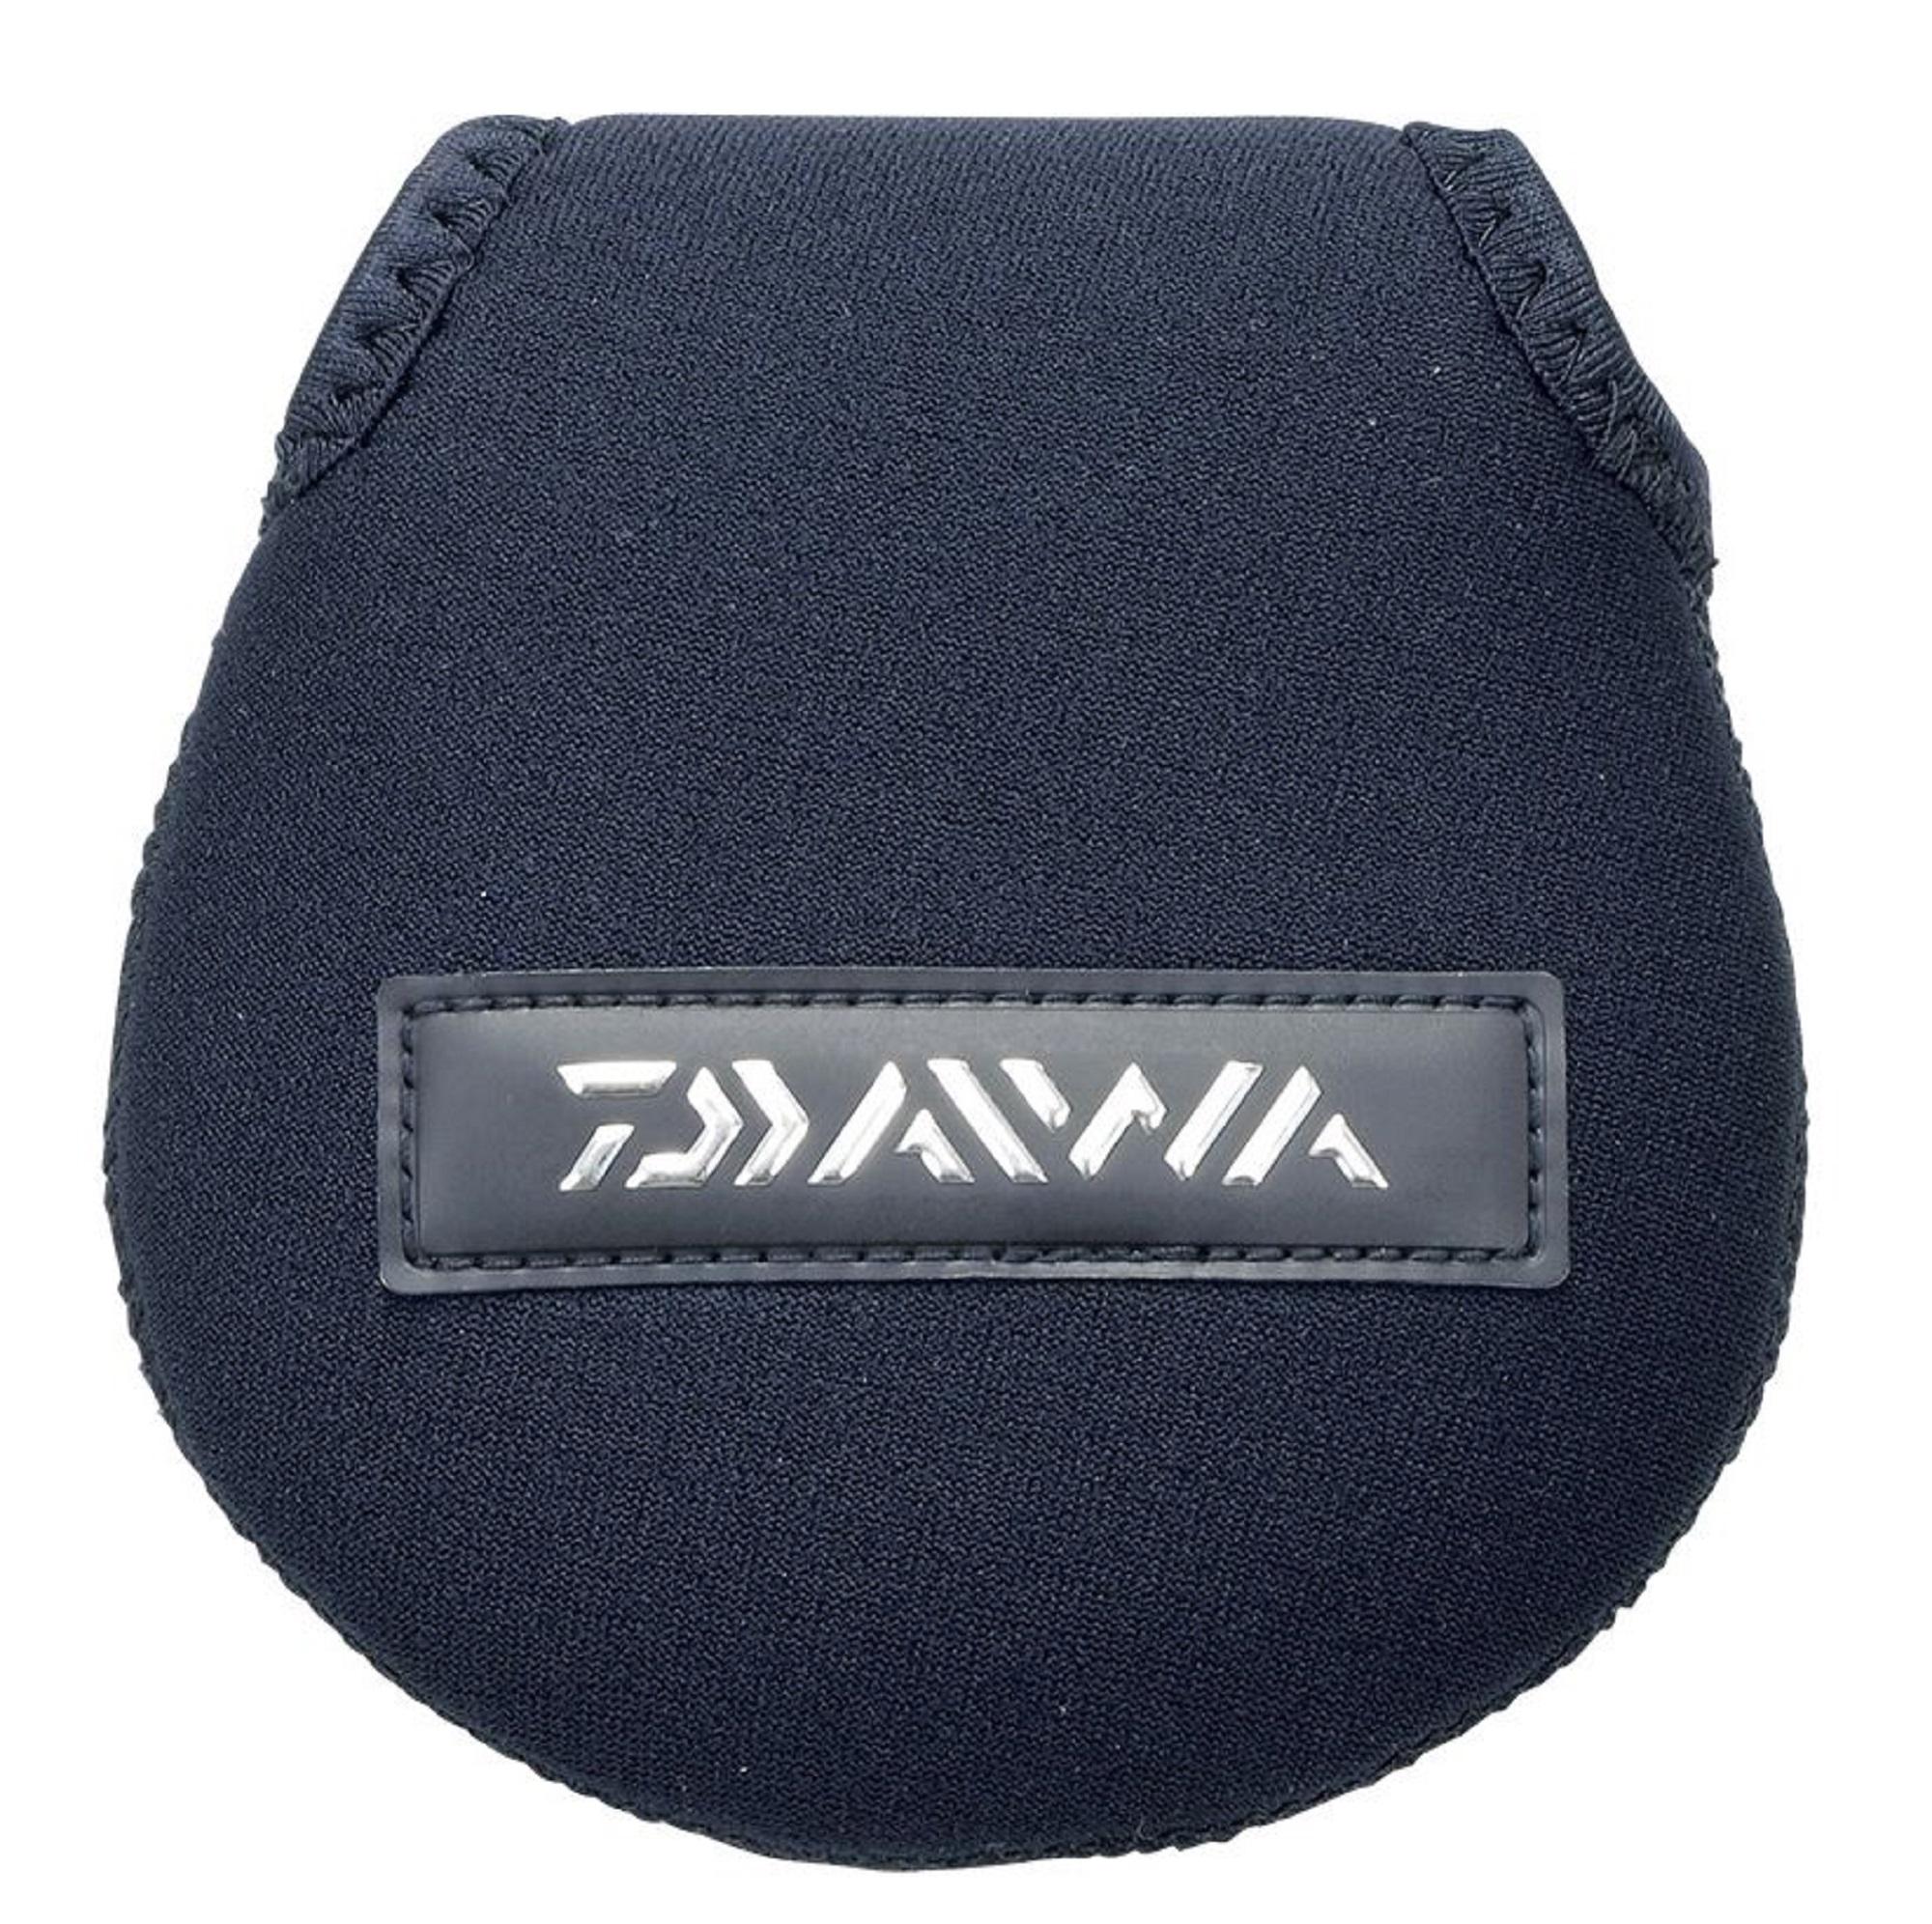 Sale Daiwa CV-S Size S Baitcast Reel Cover Size 100-150 (7047)